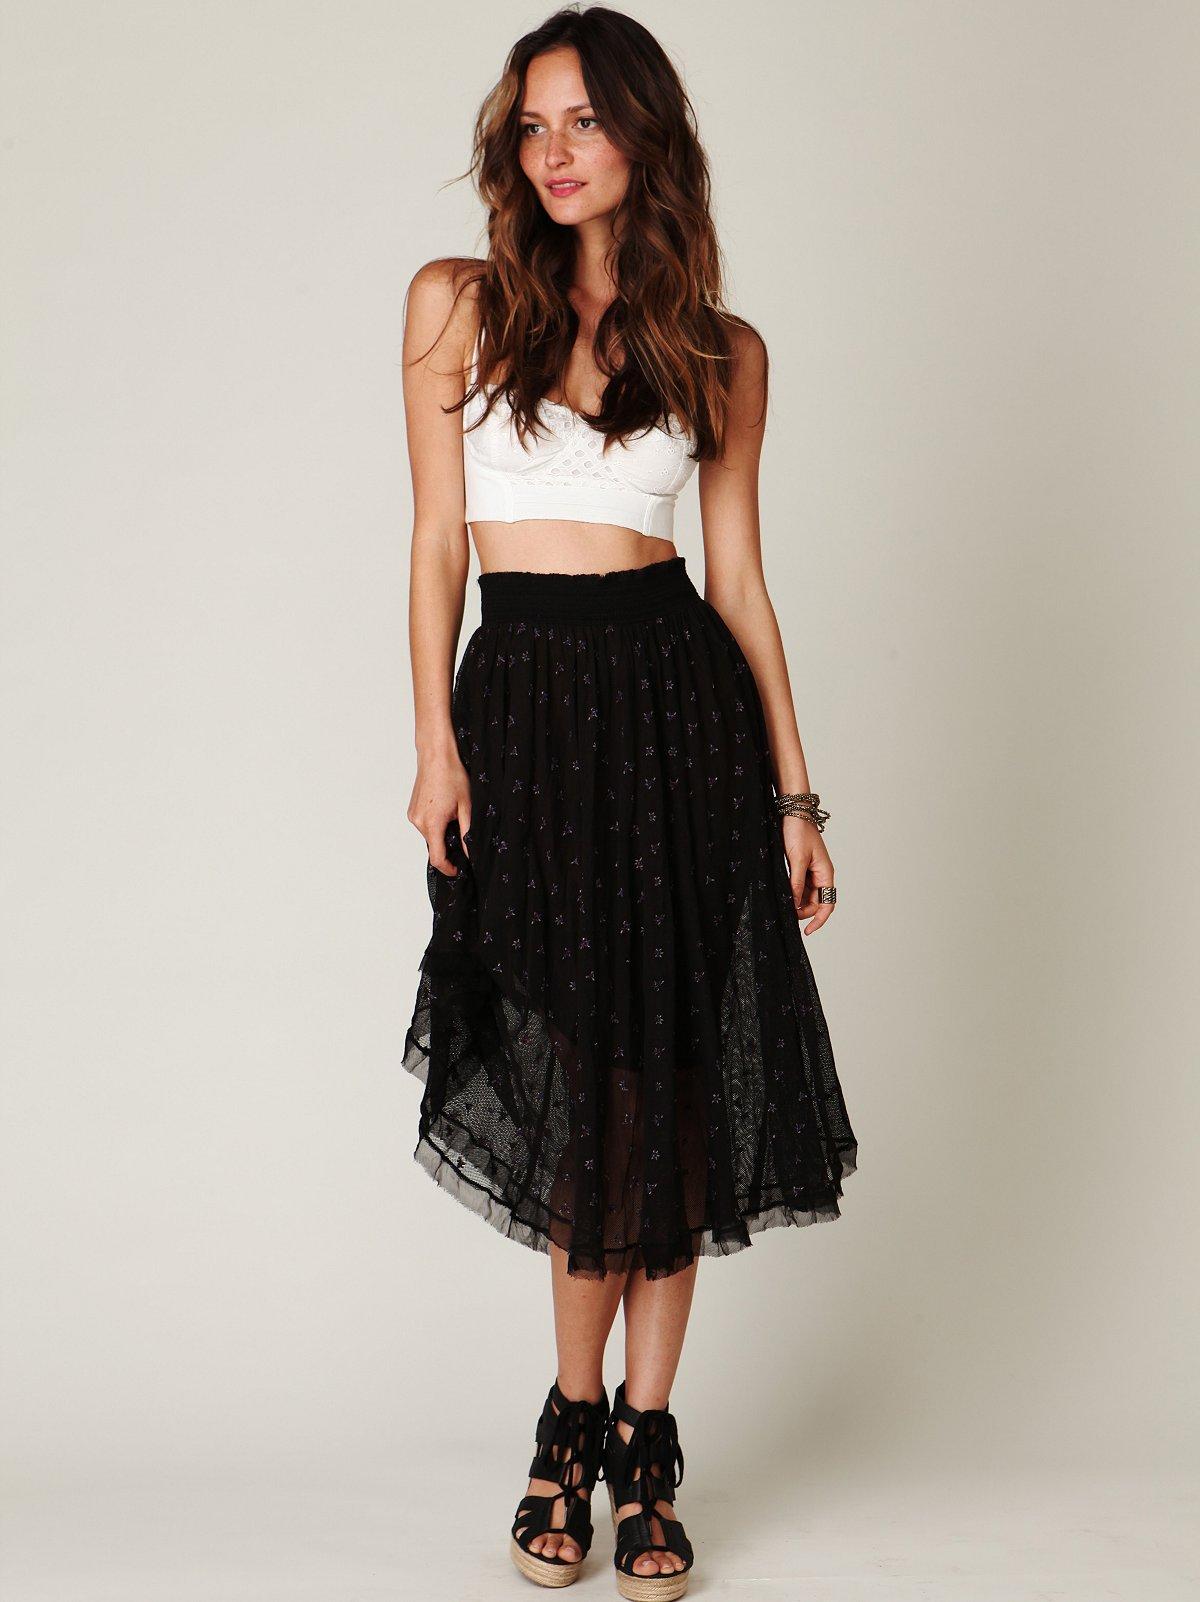 FP New Romantics Mesh Embroidered Tea Length Skirt